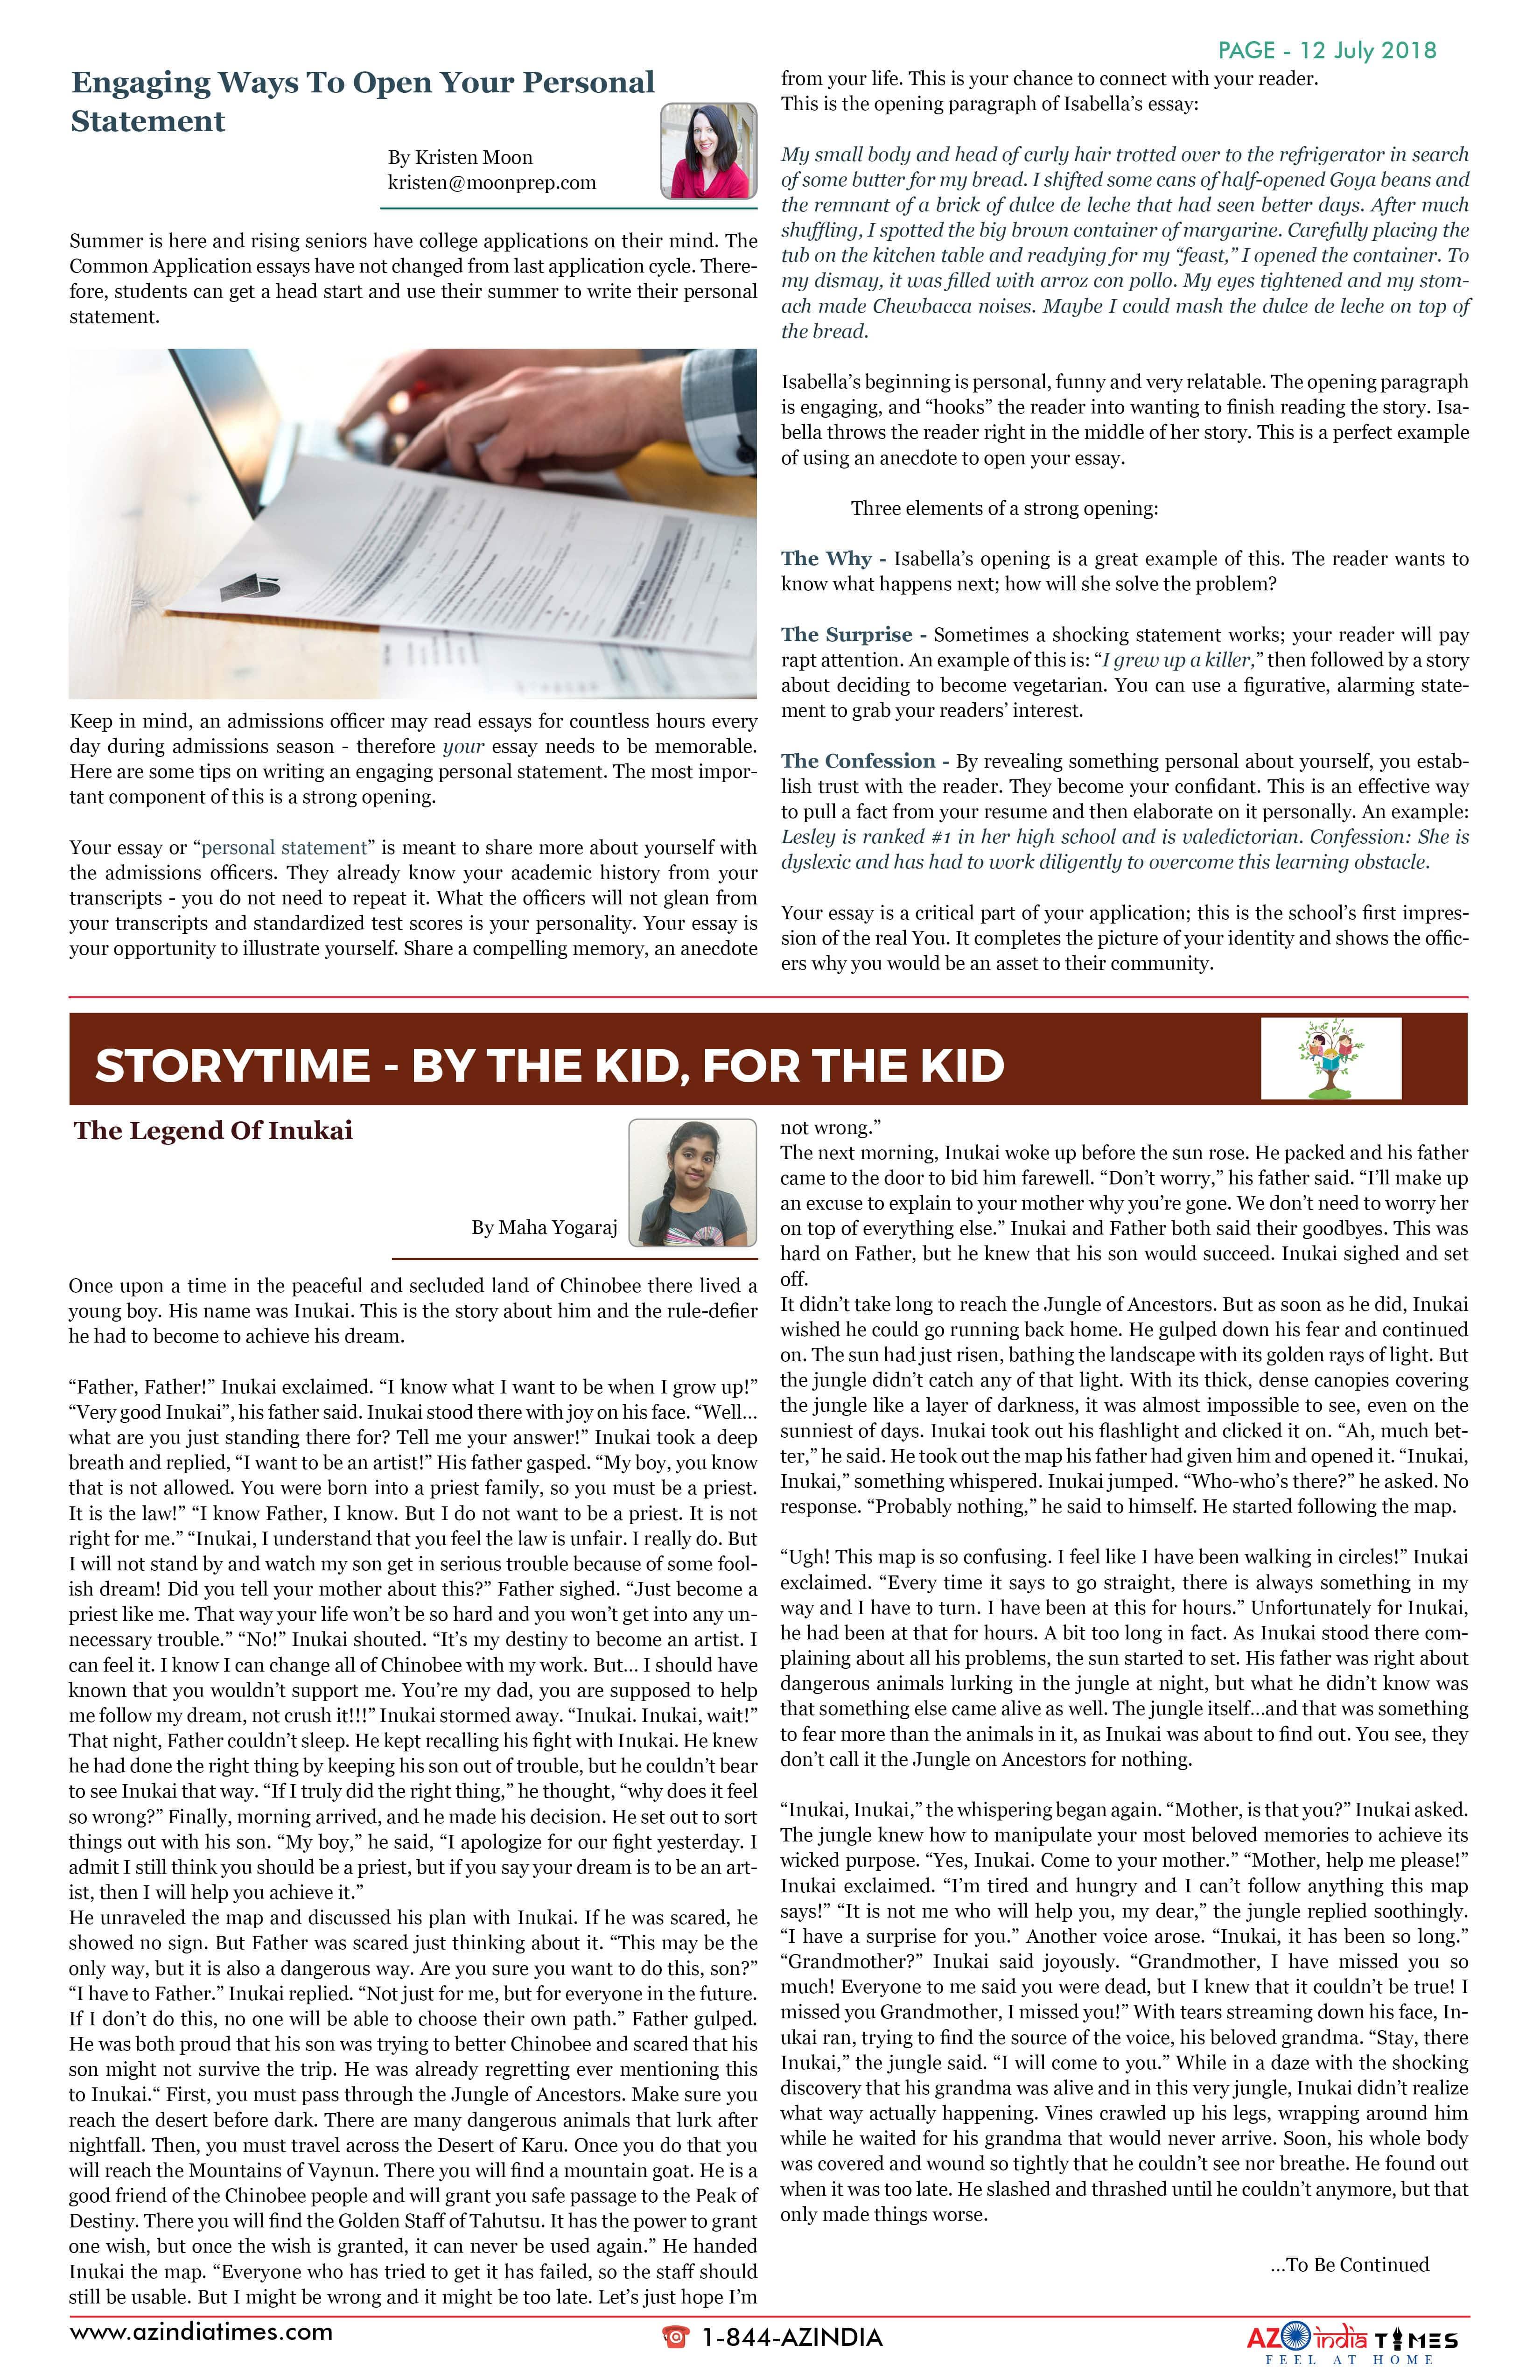 AZ INDIA JULY EDITION12